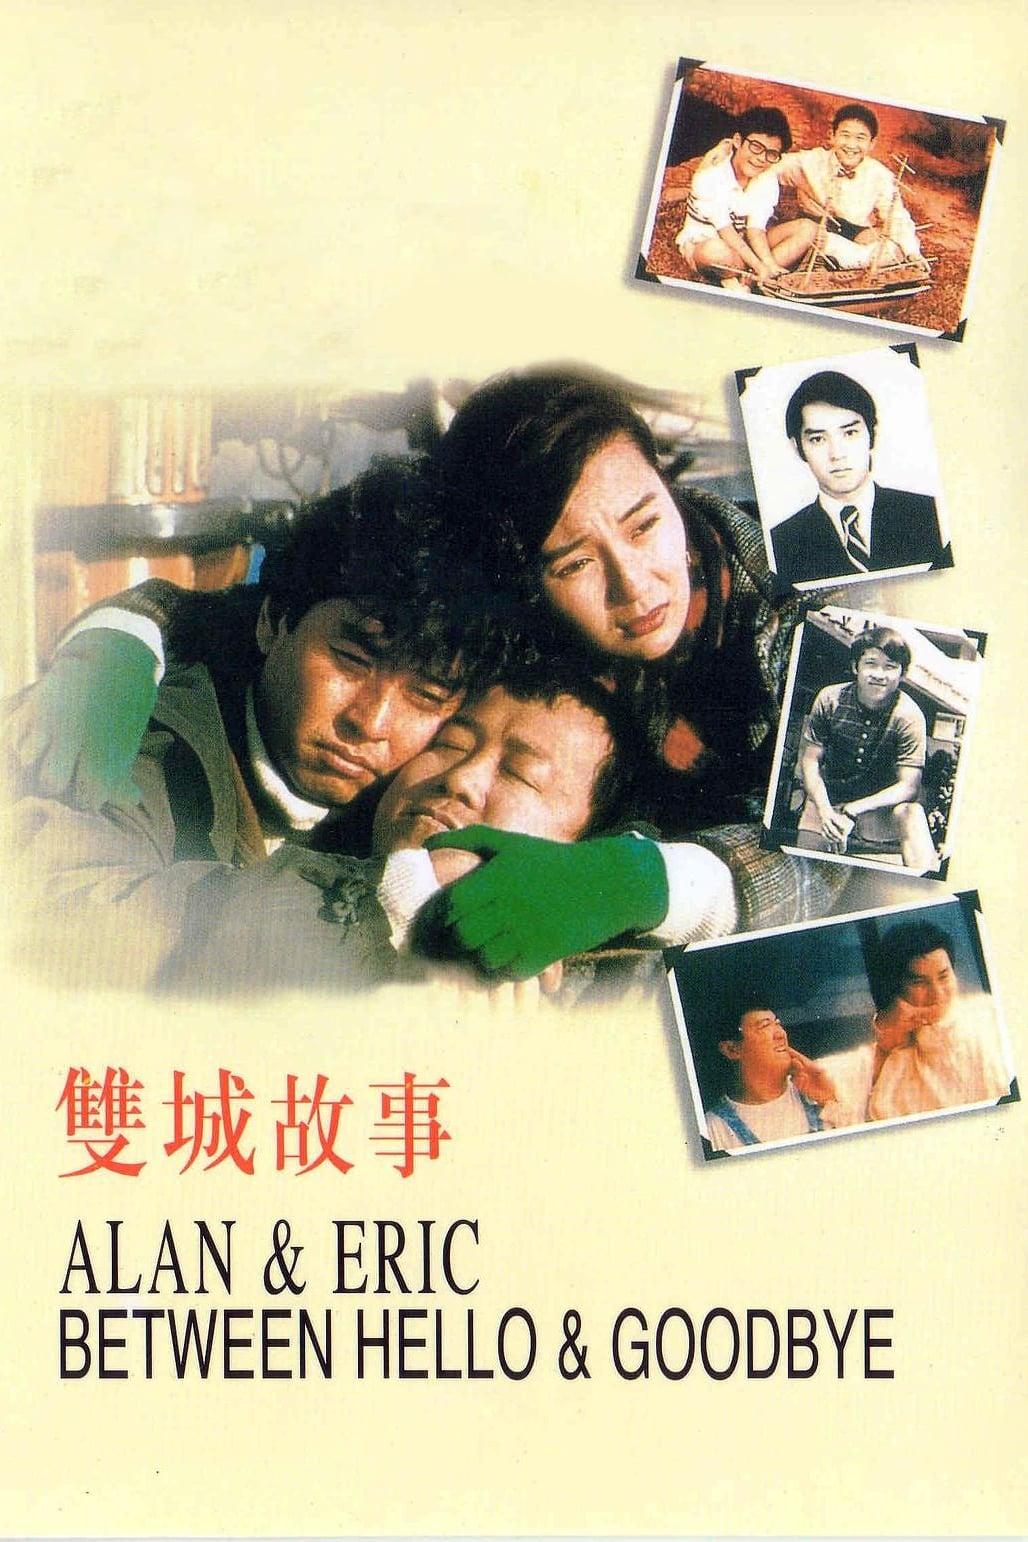 Alan and Eric: Between Hello and Goodbye